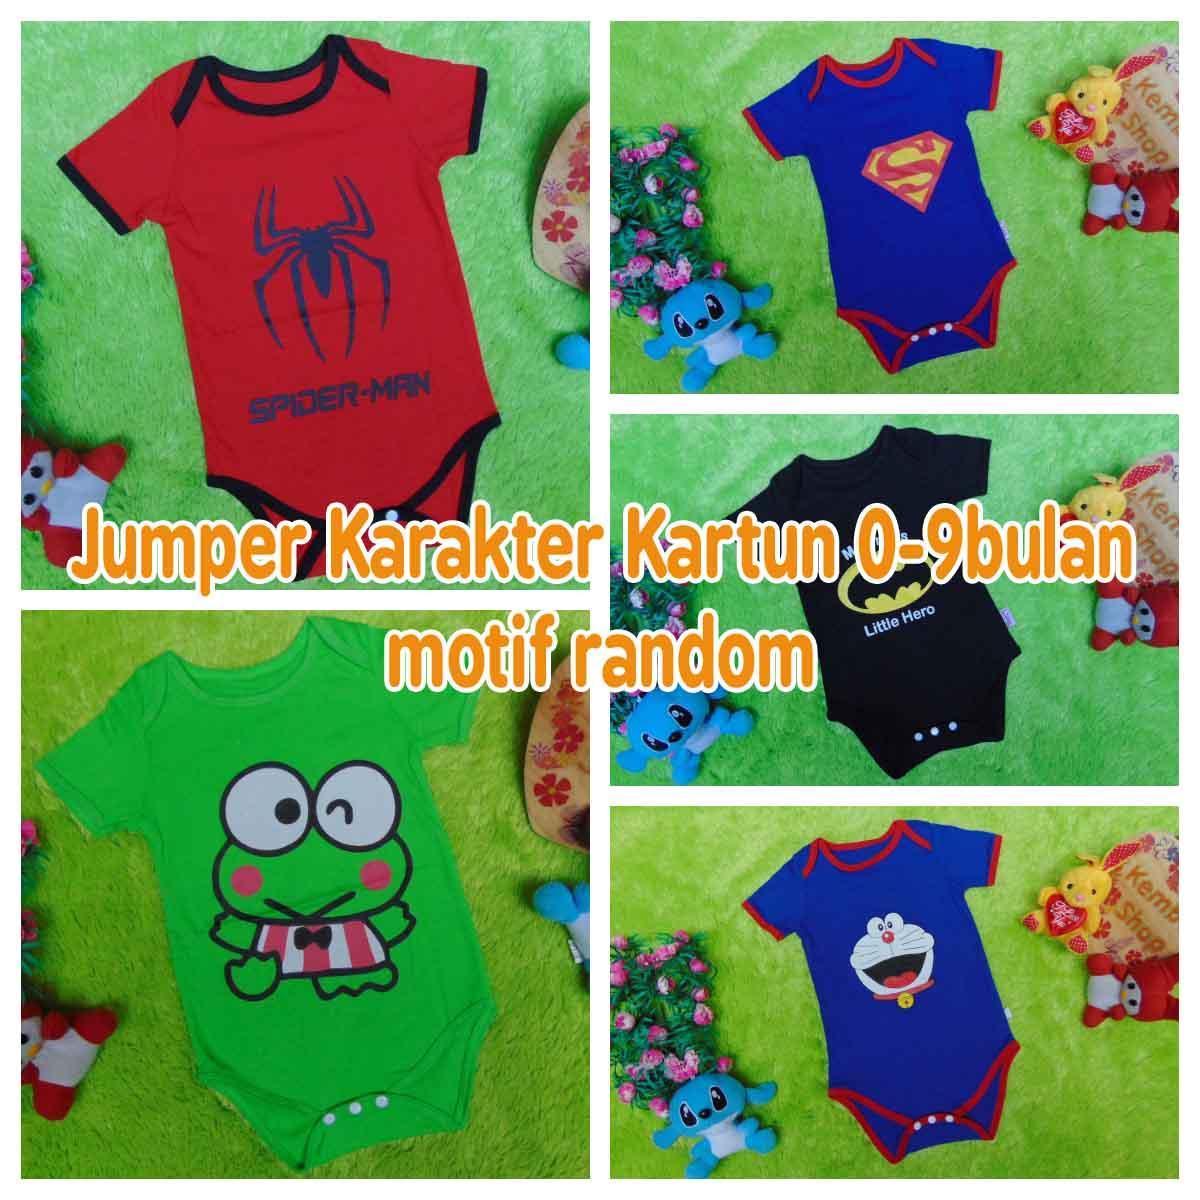 kembarshop- Jumper bayi anak cowok laki-laki newborn 0-9bulan karakter kartun n